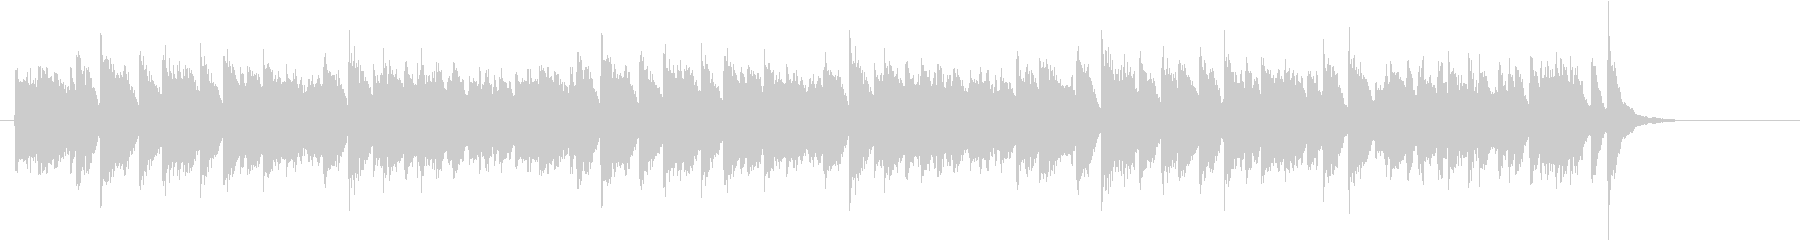 Jericho's Battle Black Spirituals on a Simple Piano's unreproduced waveform